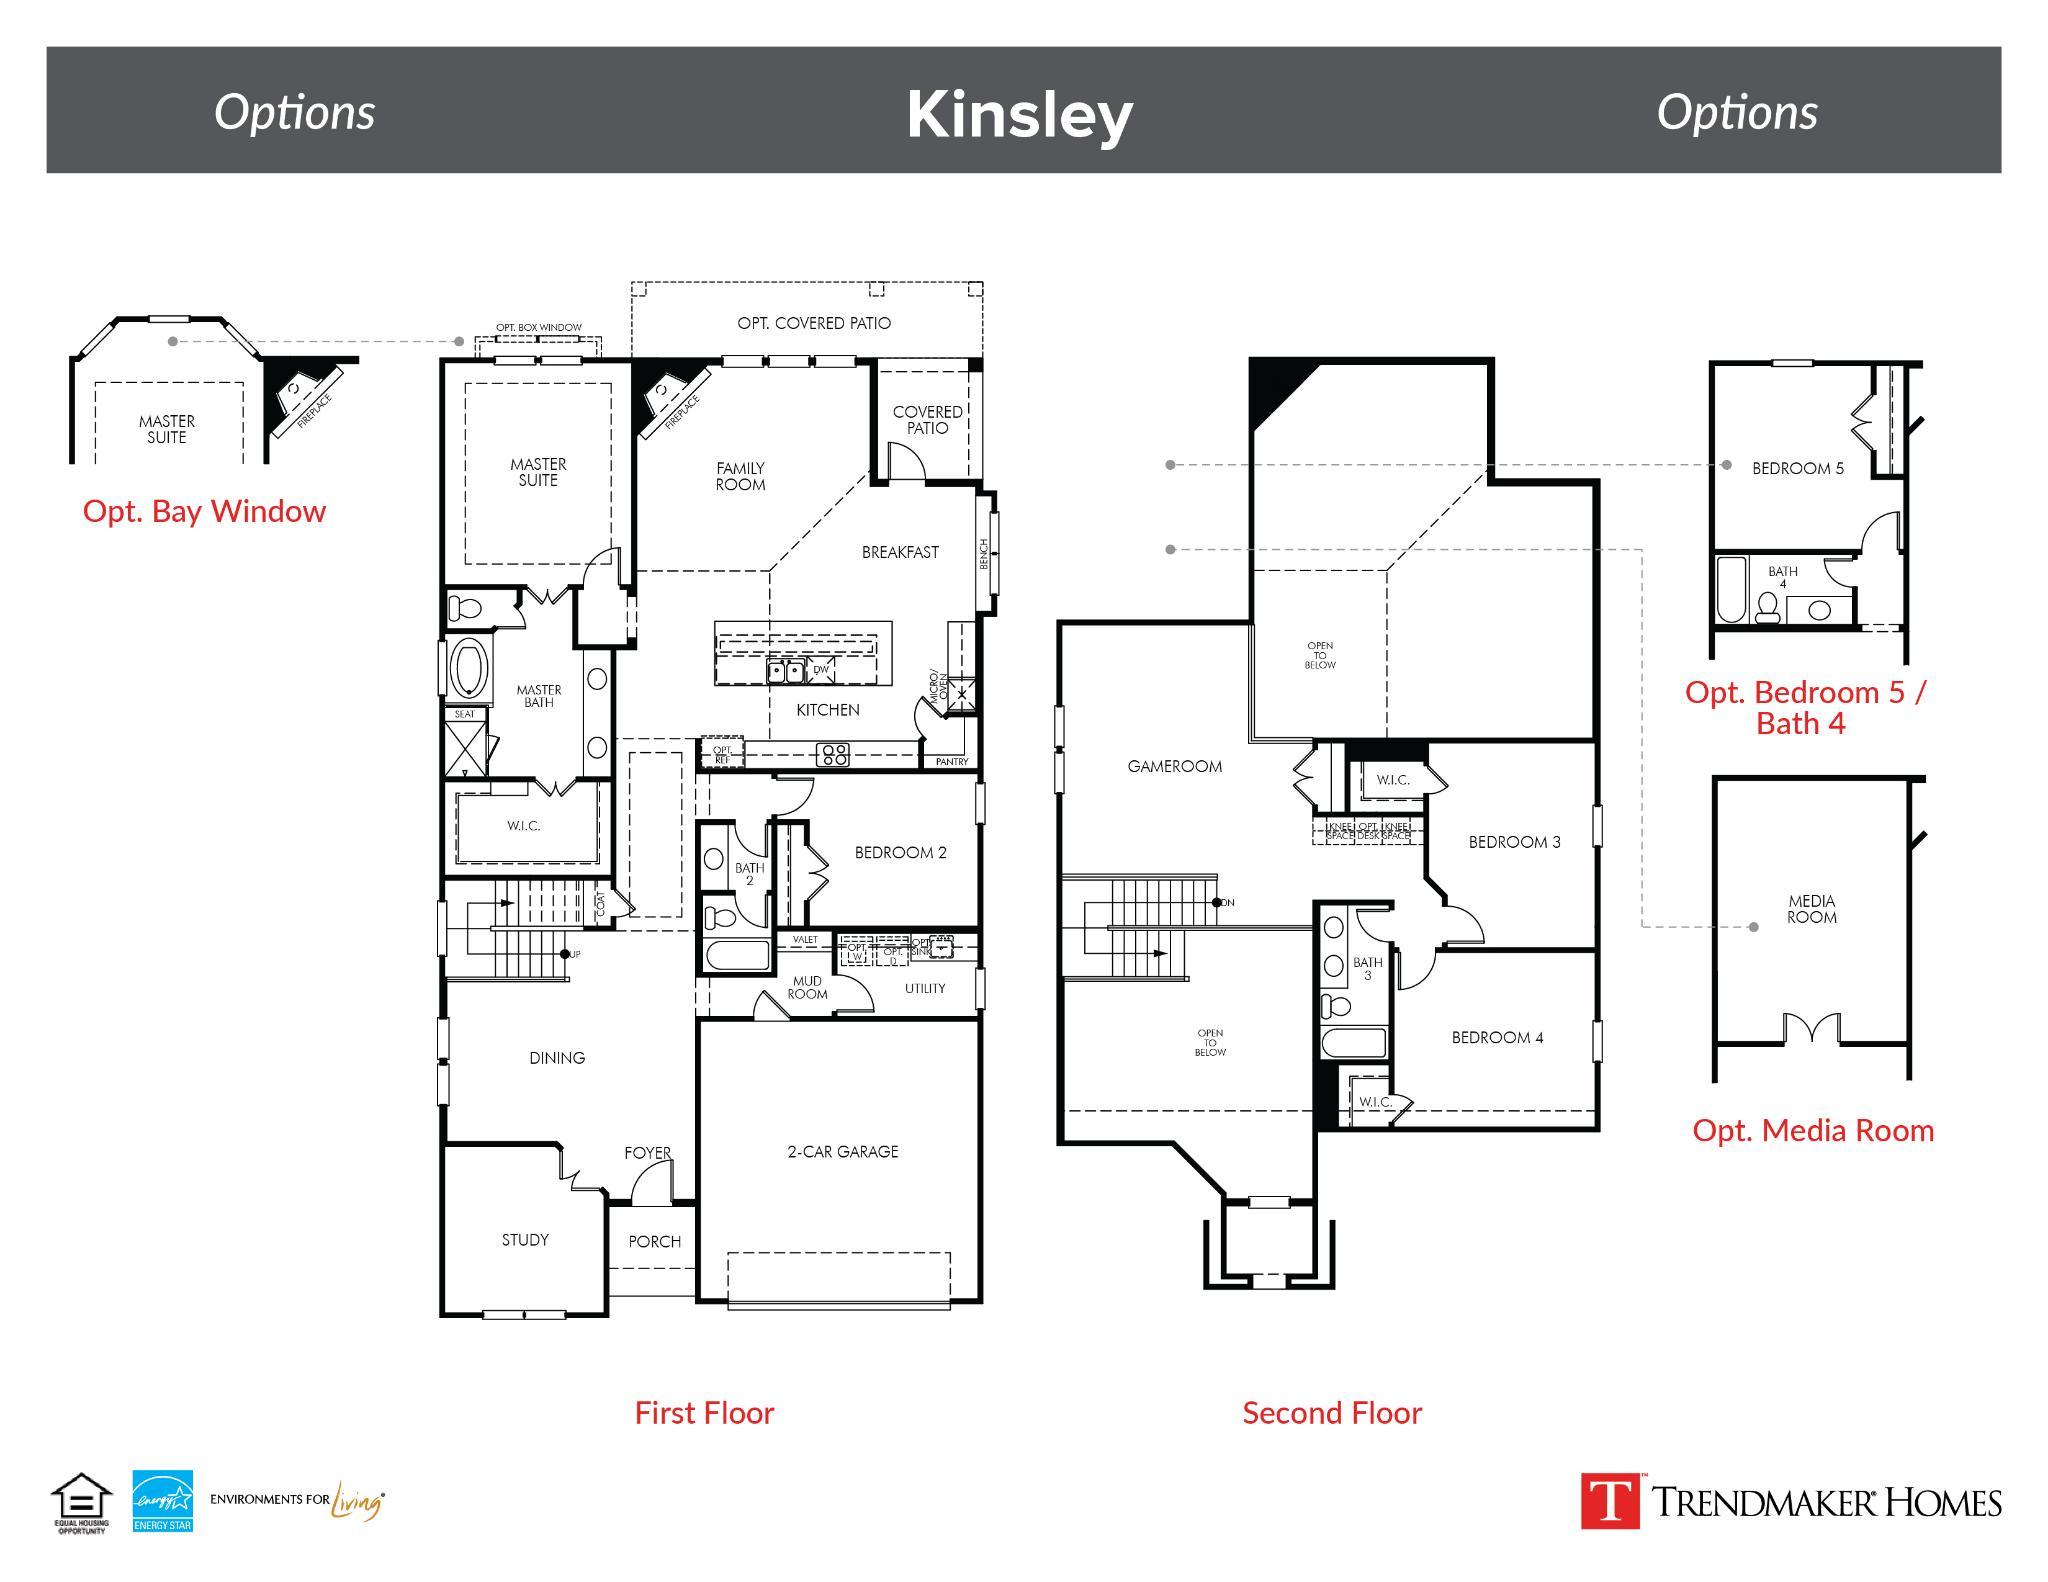 Kinsley - Parks at Legacy